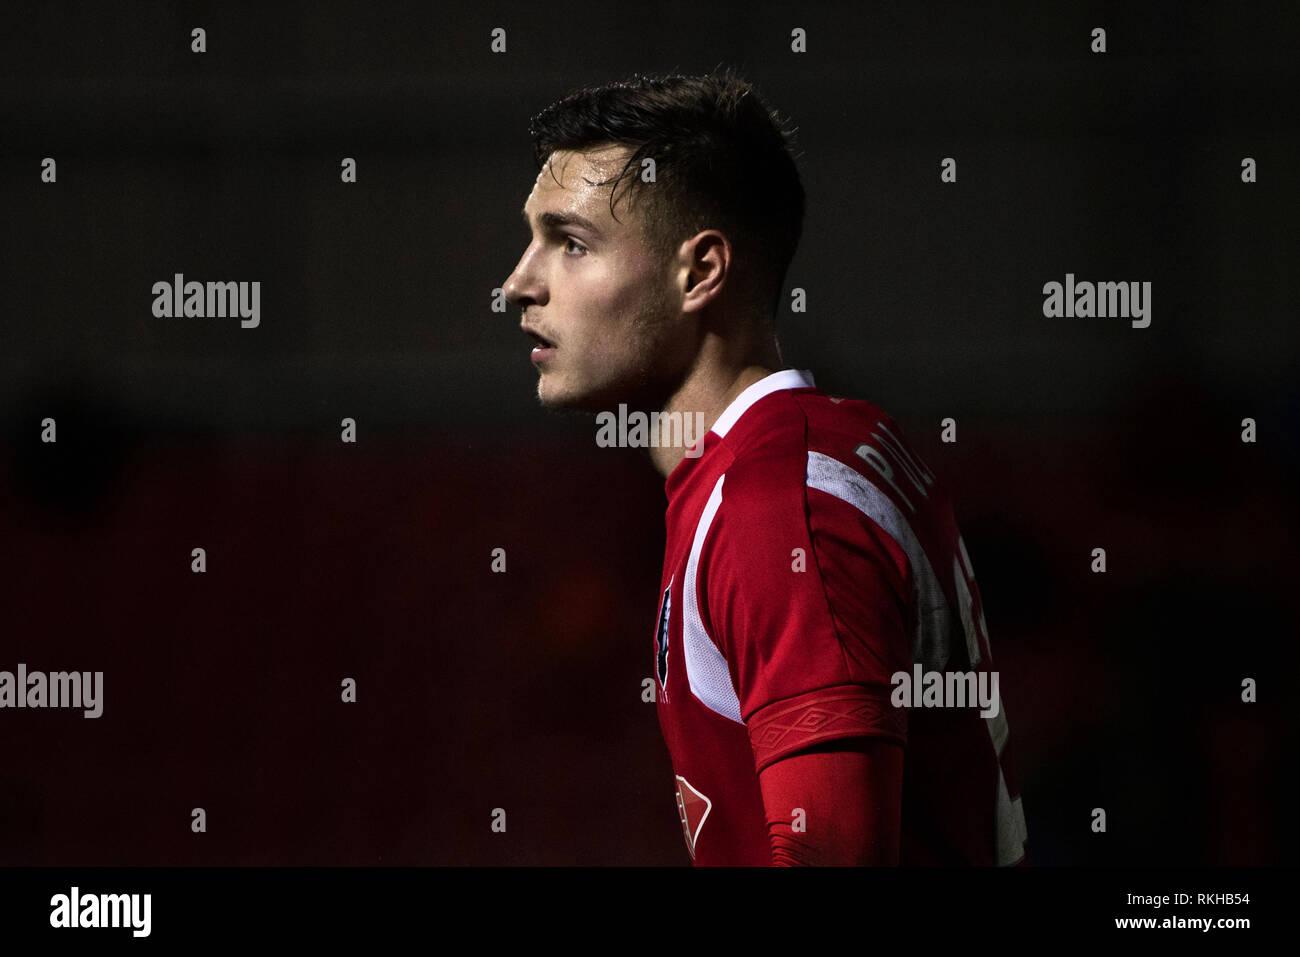 Denis Politic. Salford City FC. - Stock Image